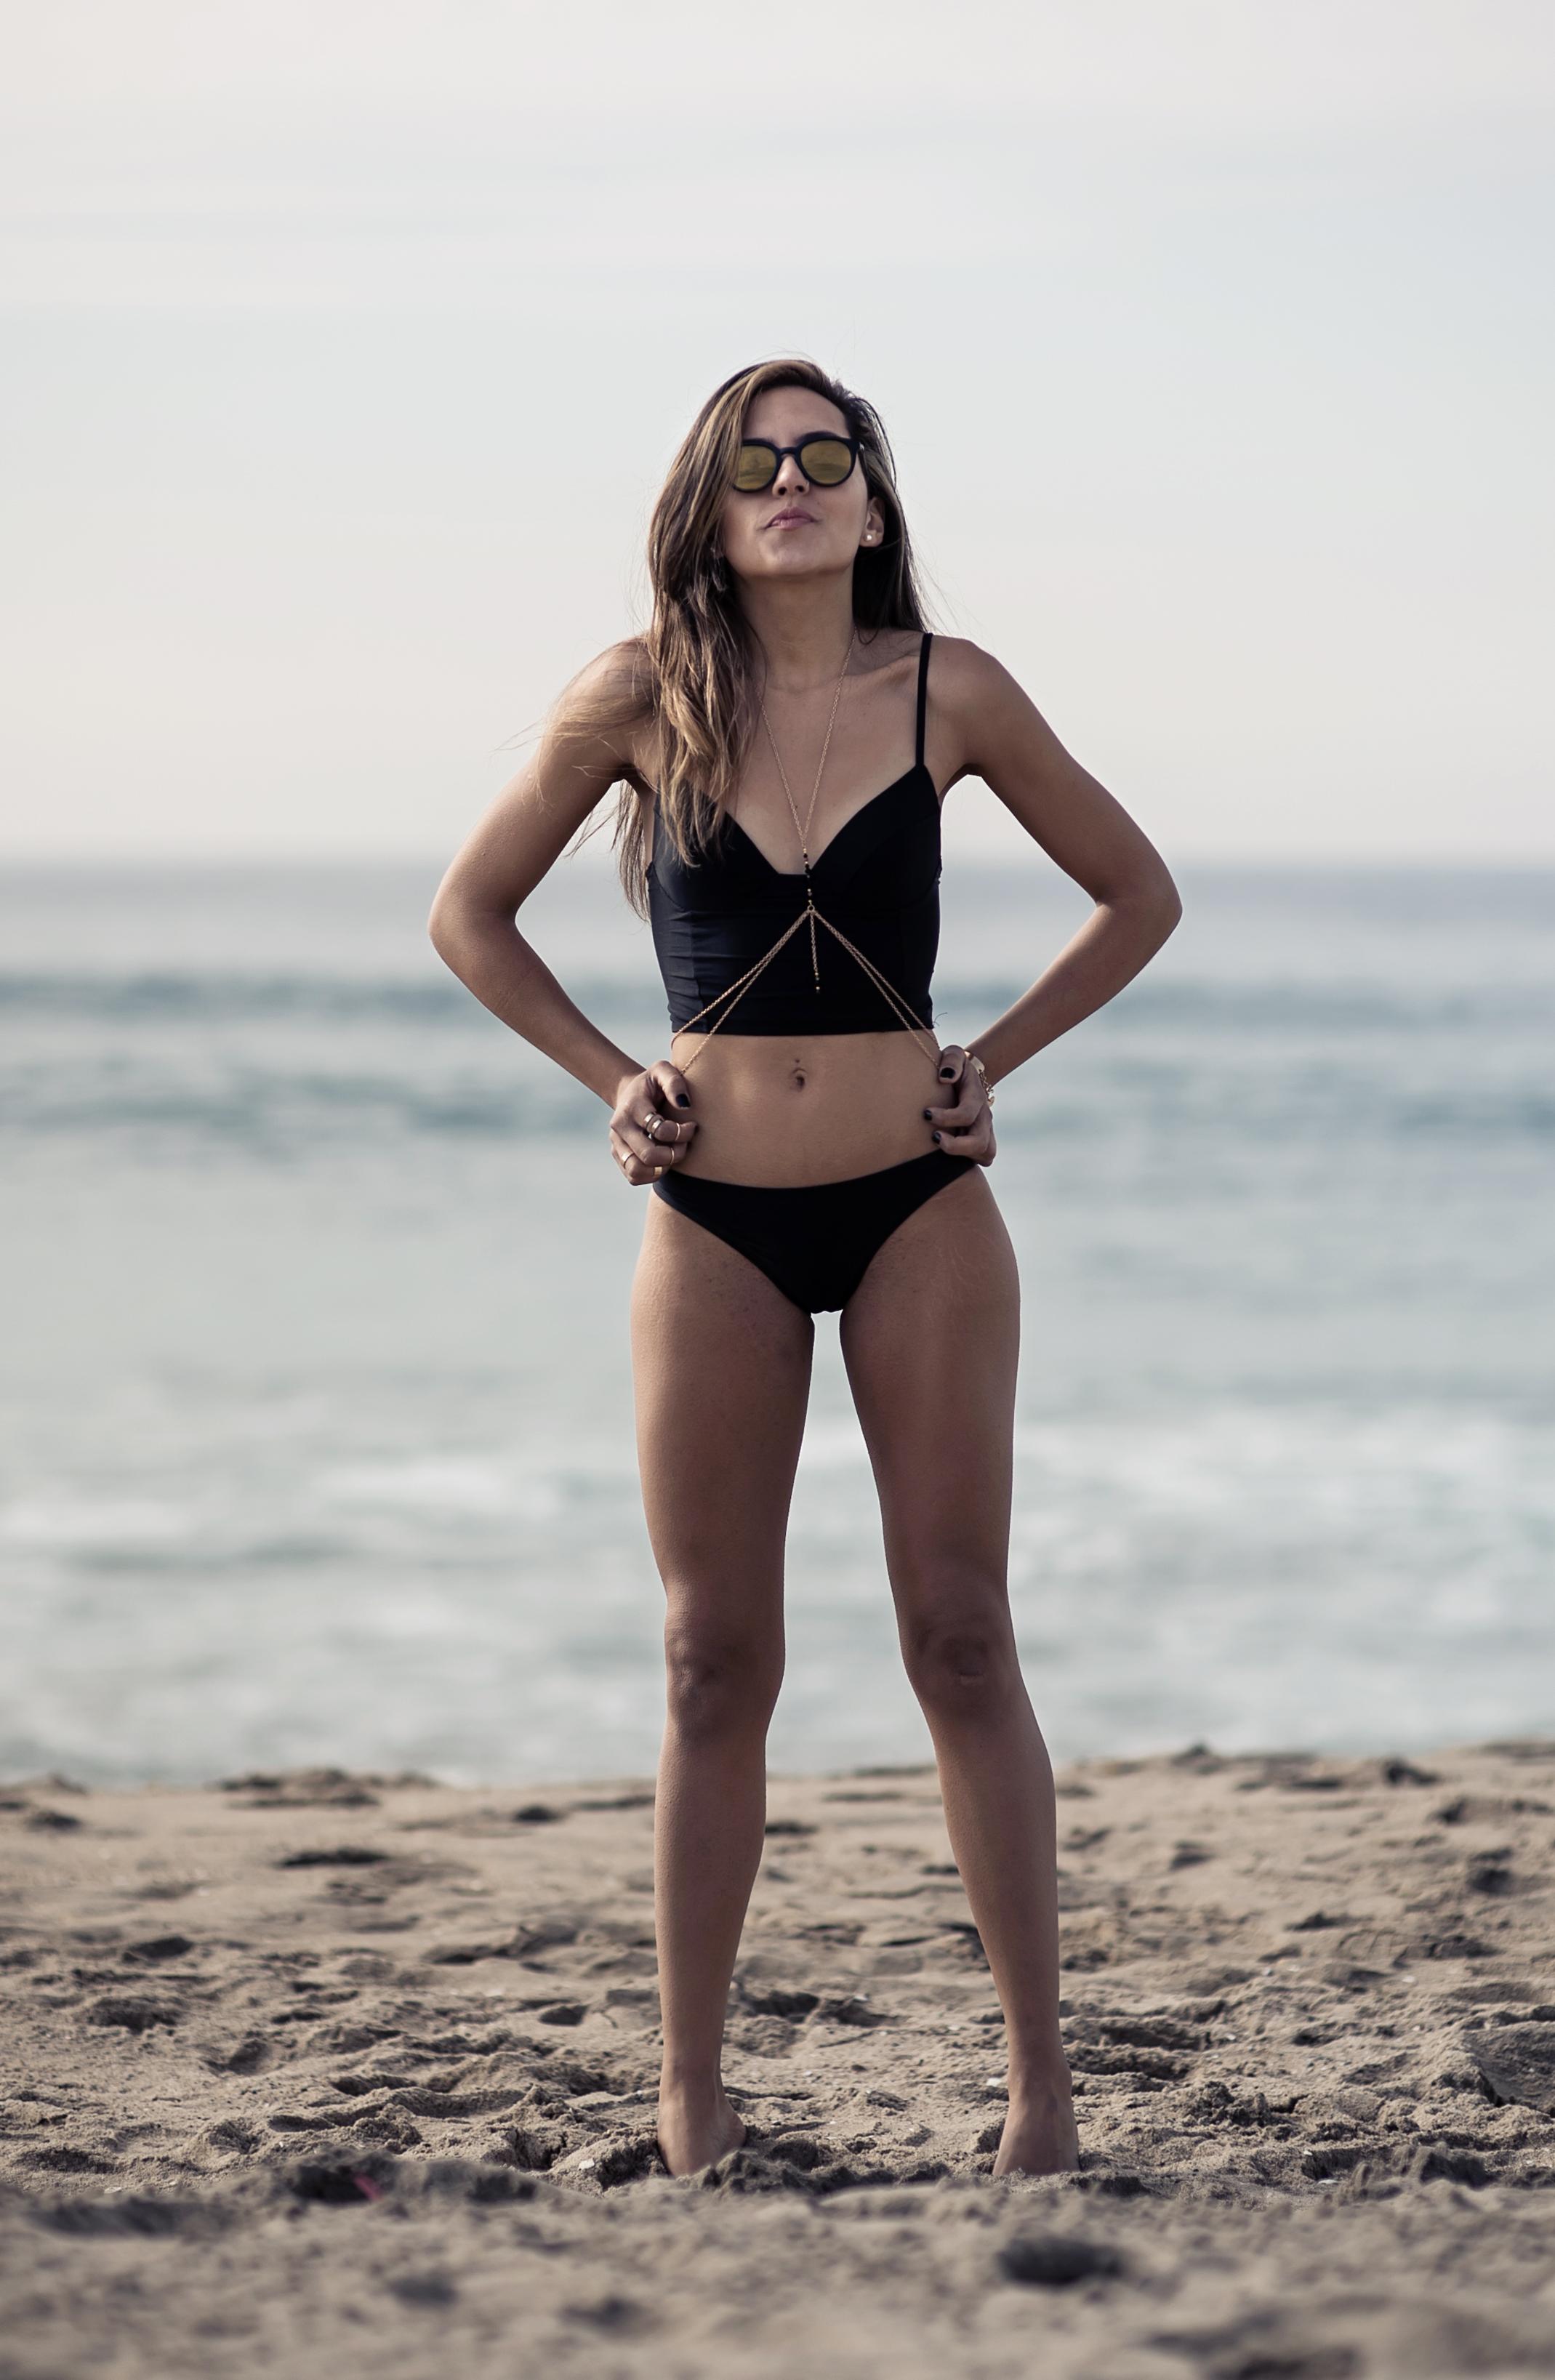 Little Black Bikini By Jaime Ashley